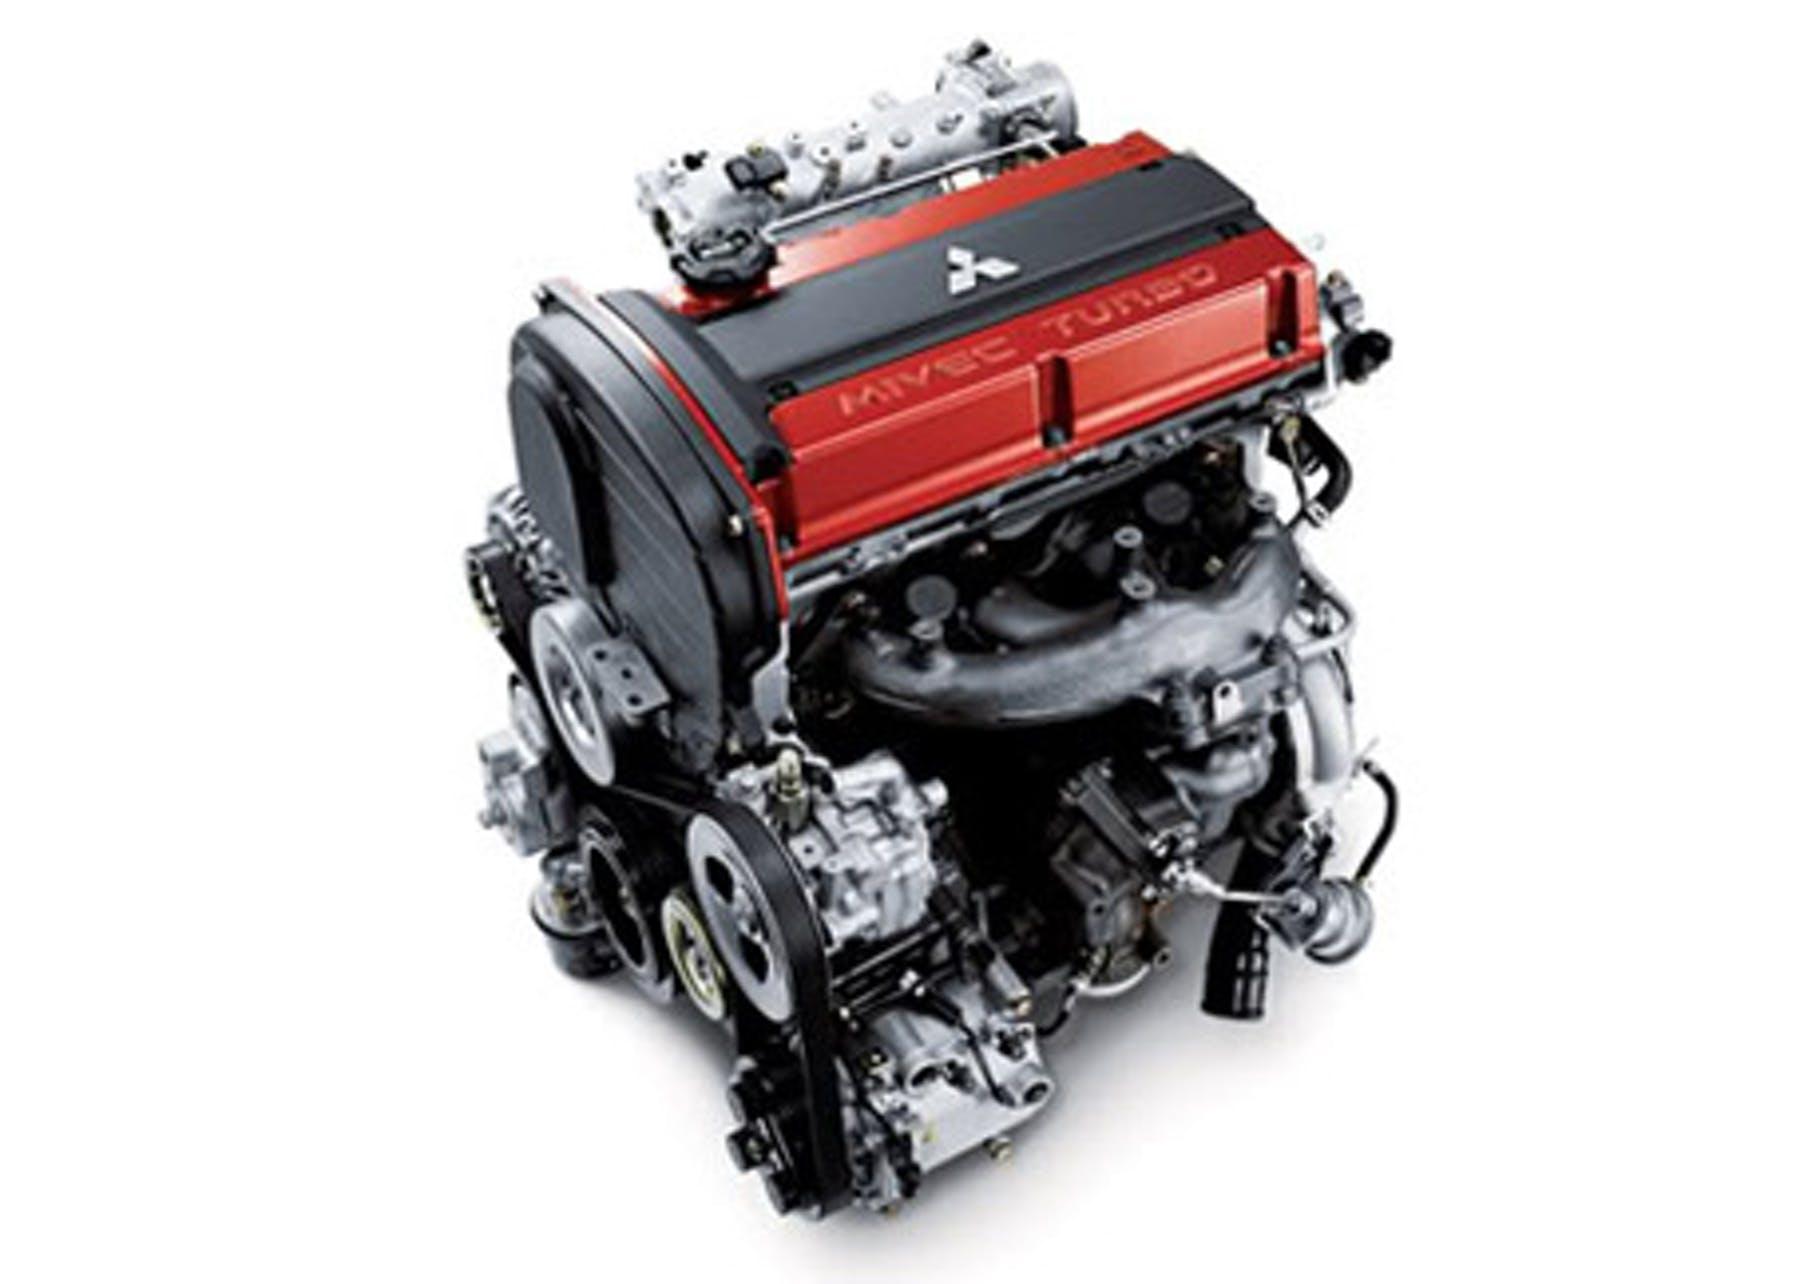 Mitsubishi JDM engines are great.